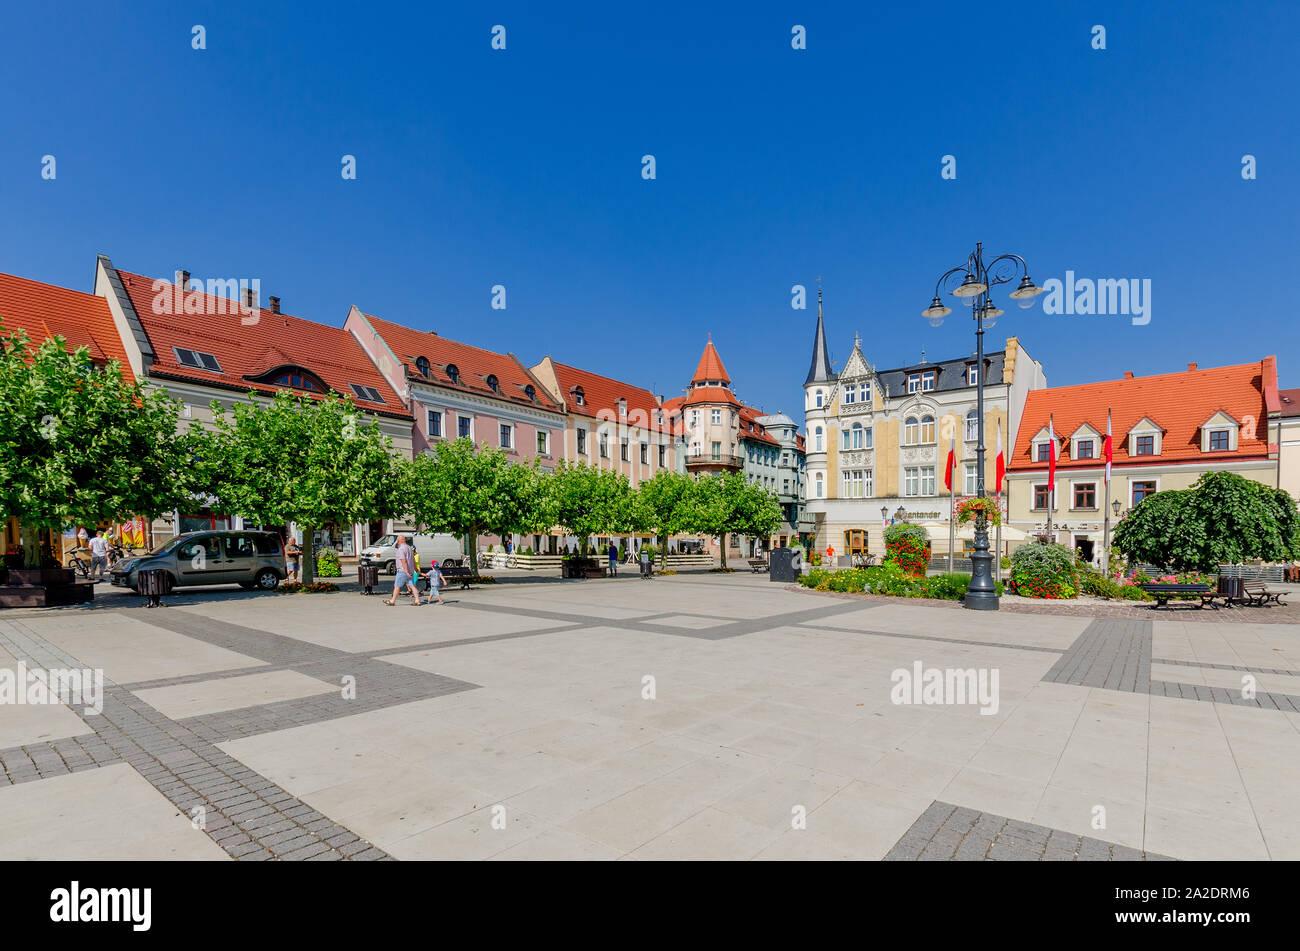 Pszczyna (ger.: Pless), Silesian province, Poland. The Marketplace Stock Photo